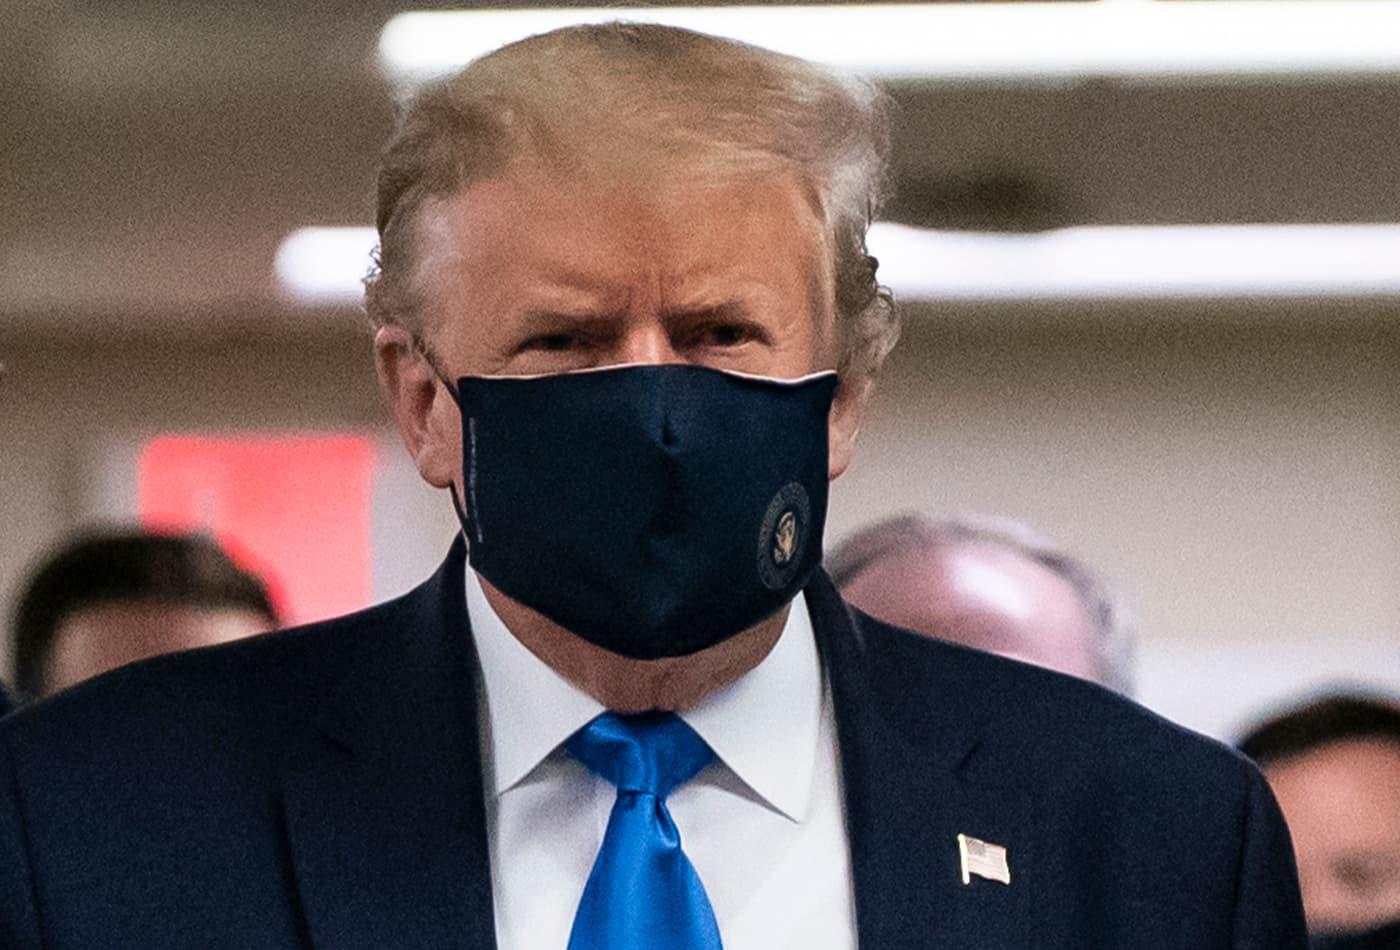 TrumpVirus 2020 - cover